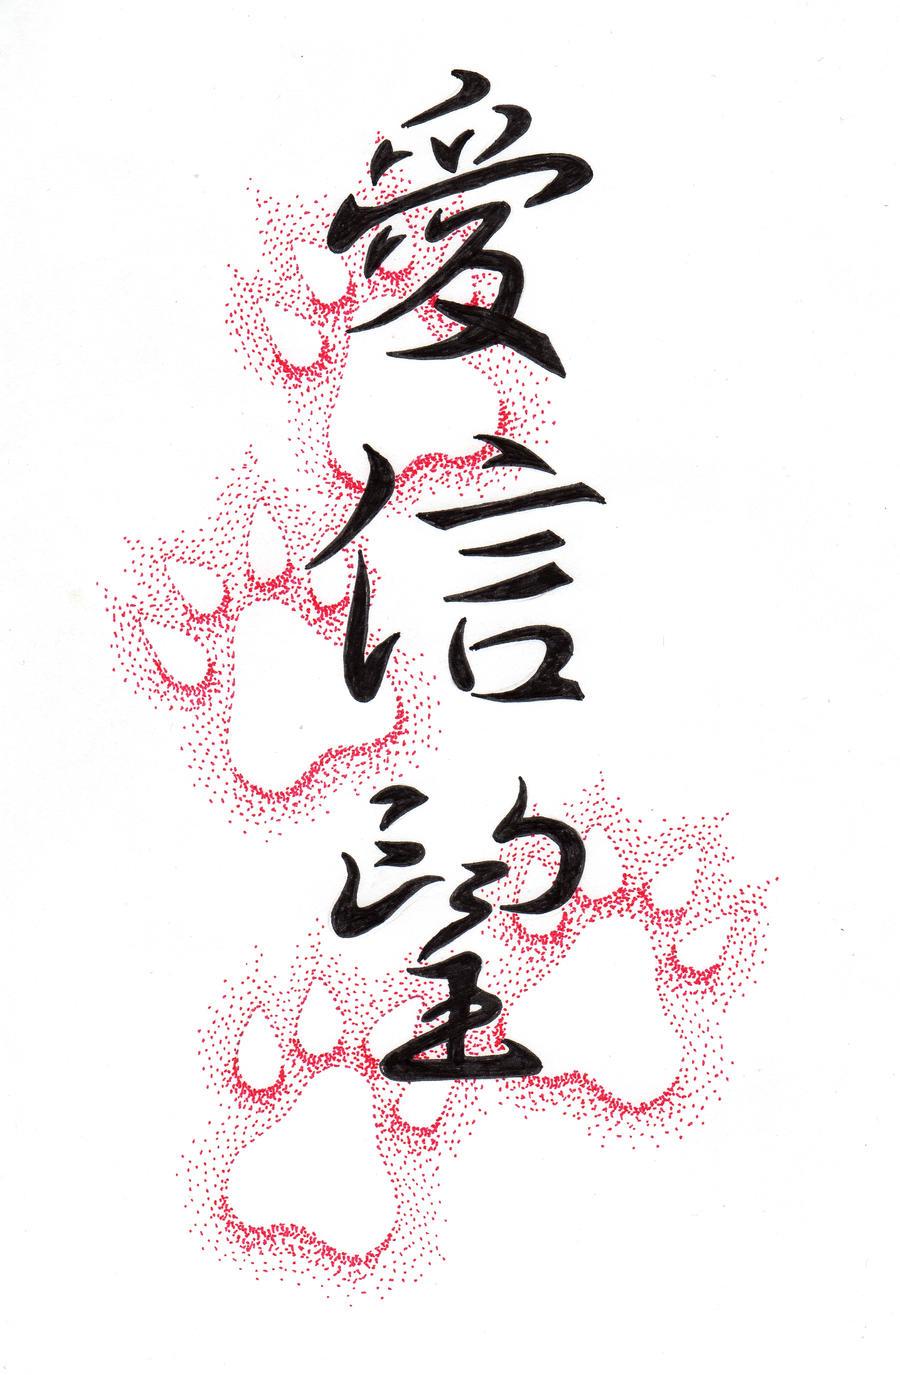 Love faith hope kanji flash by dotworktattoo on deviantart for Faith hope love tattoo meaning